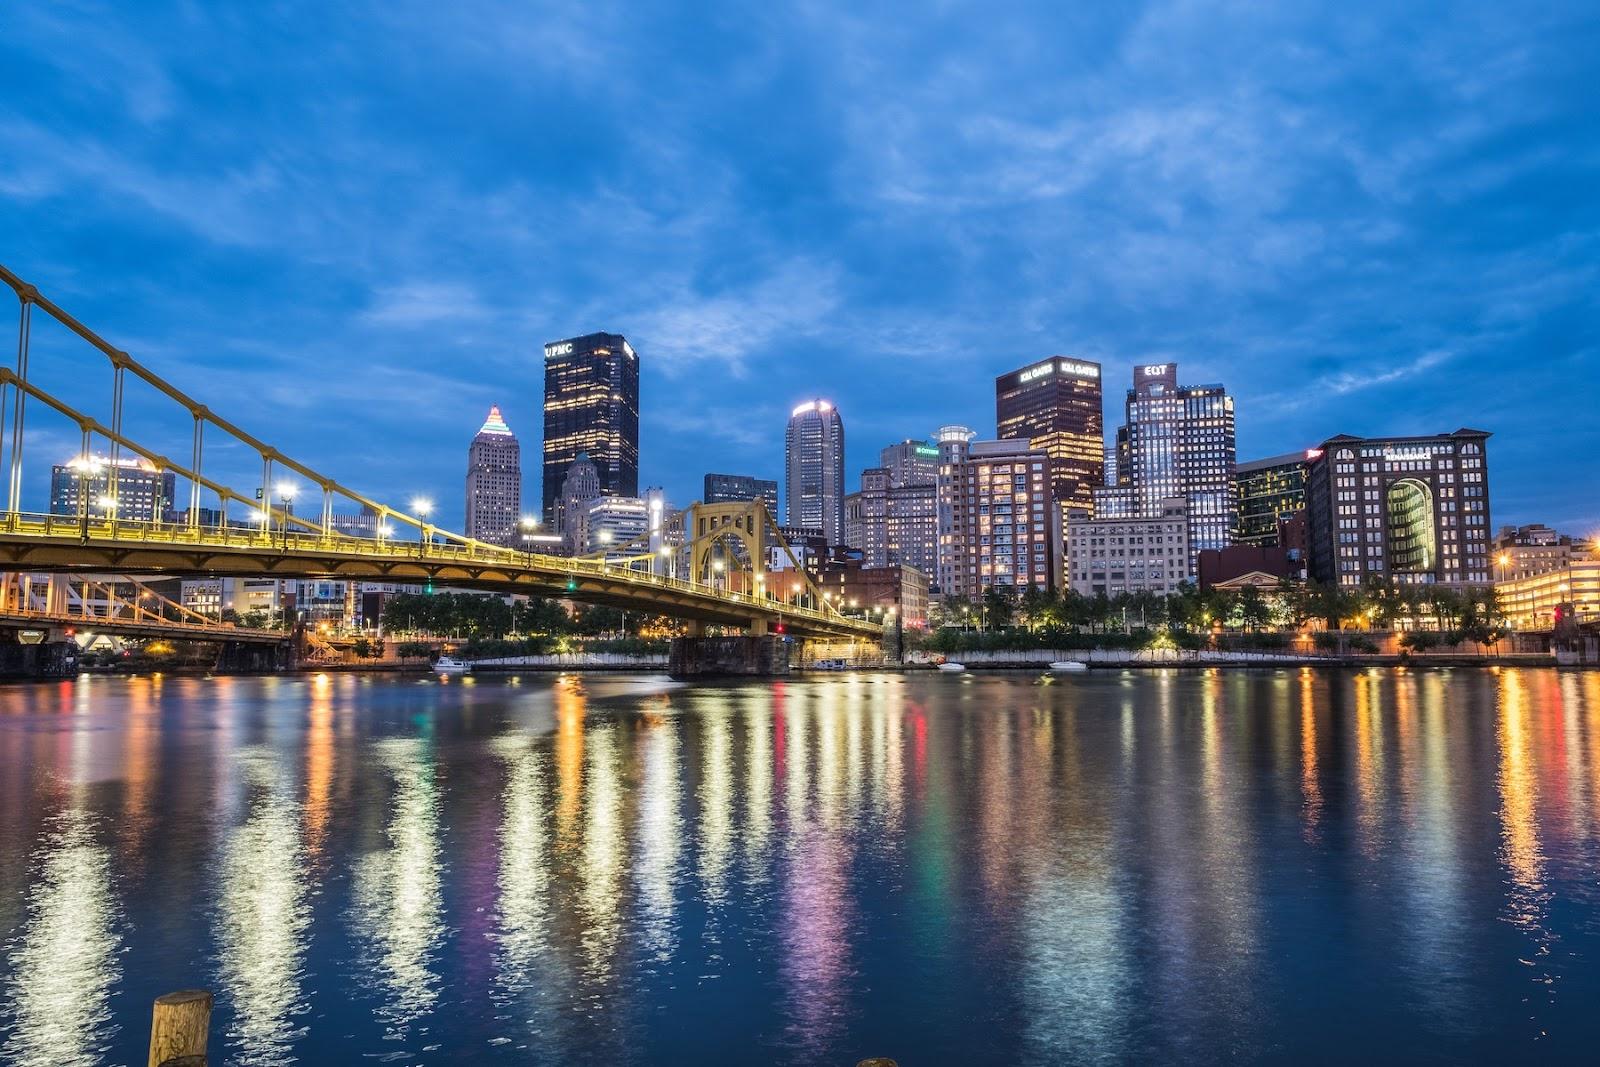 Pittsburgh skyline at night